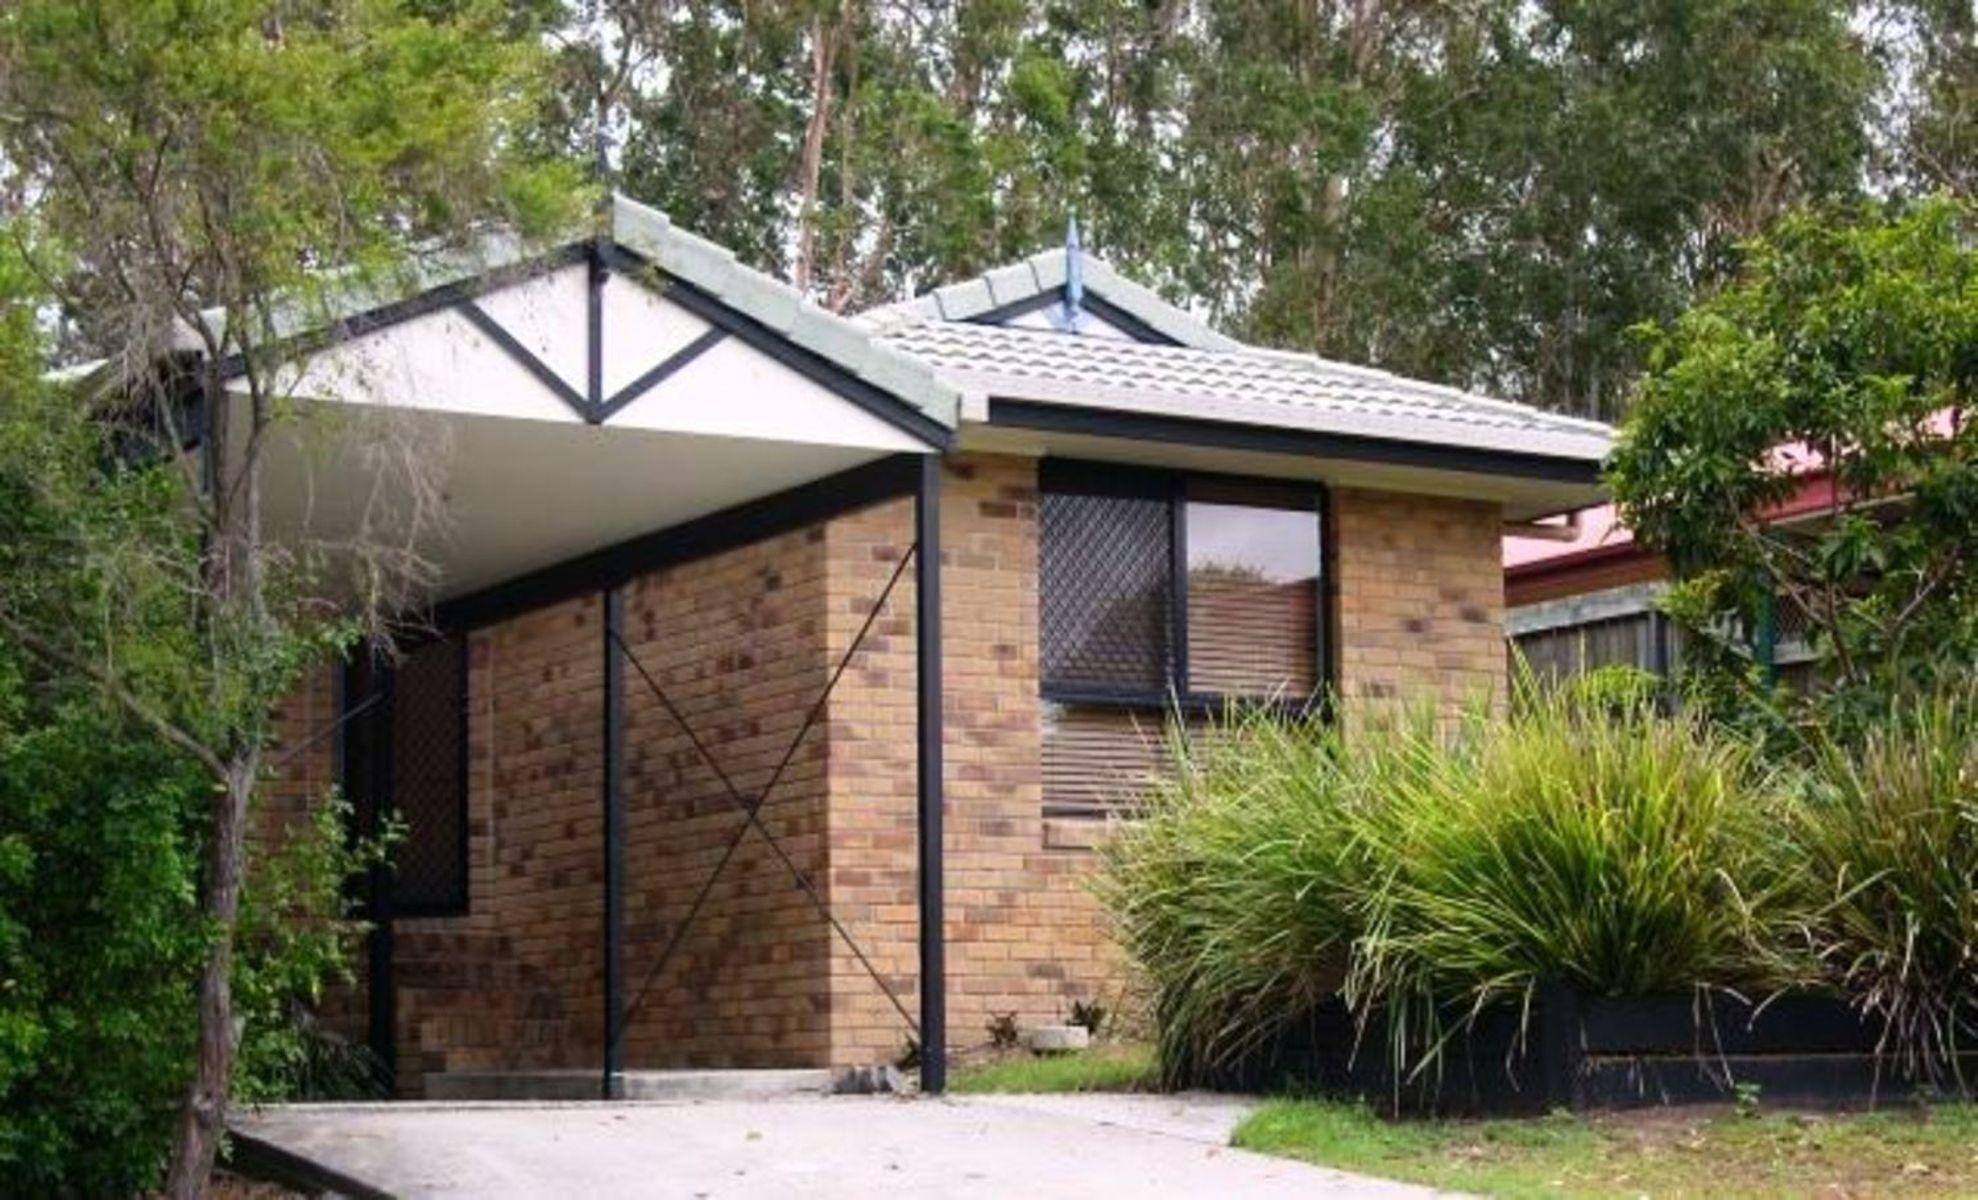 7 kingfisher cl loganlea qld 4131 australia house for. Black Bedroom Furniture Sets. Home Design Ideas